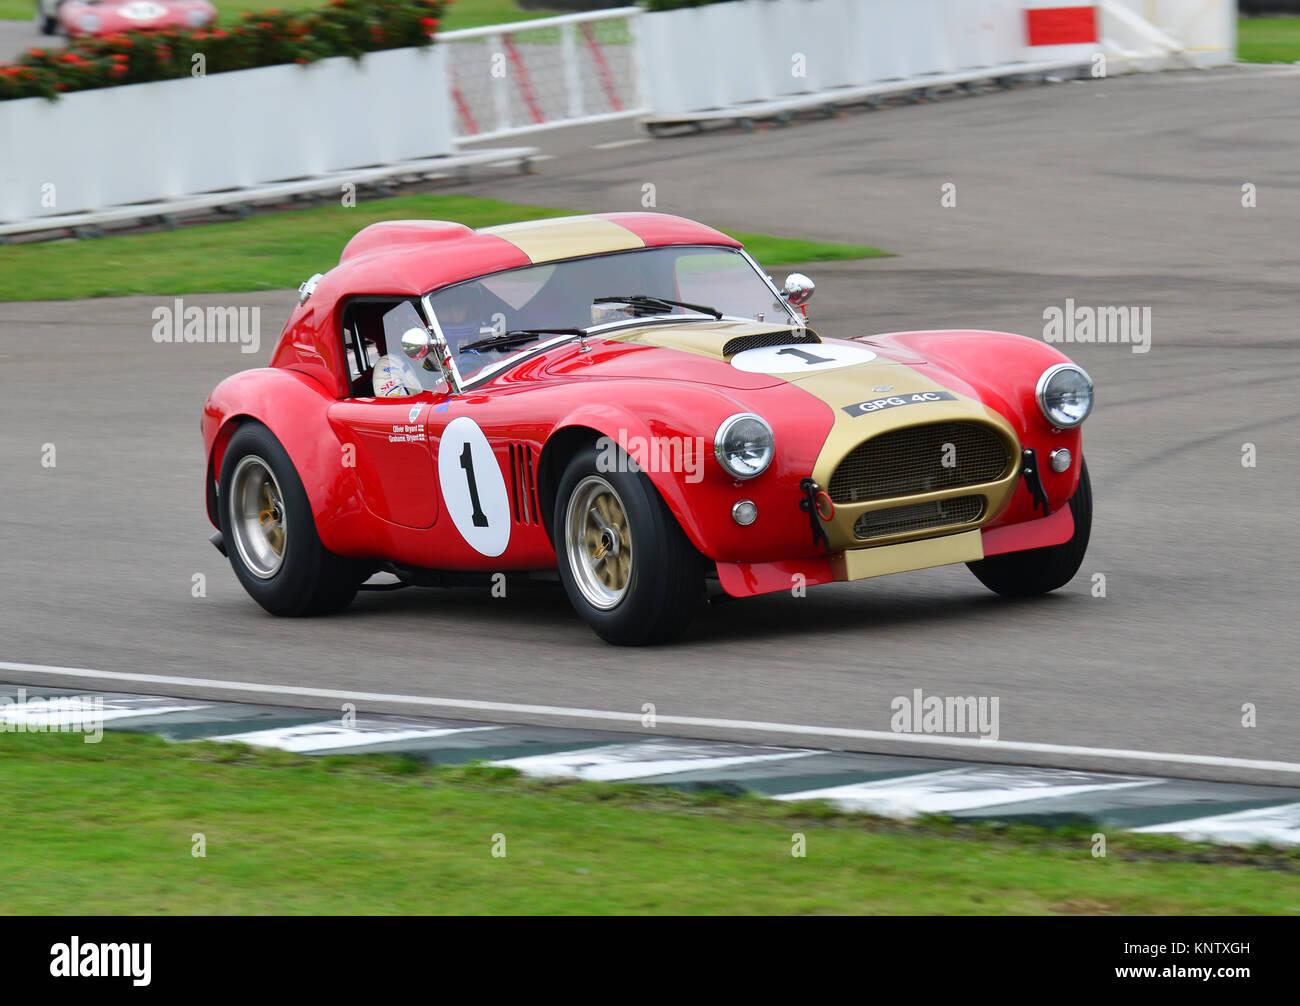 Grahame Bryant, Oliver Bryant, AC Cobra, Royal Automobile Club TT Celebration, Goodwood Revival 2013. GPG 4 C. - Stock Image